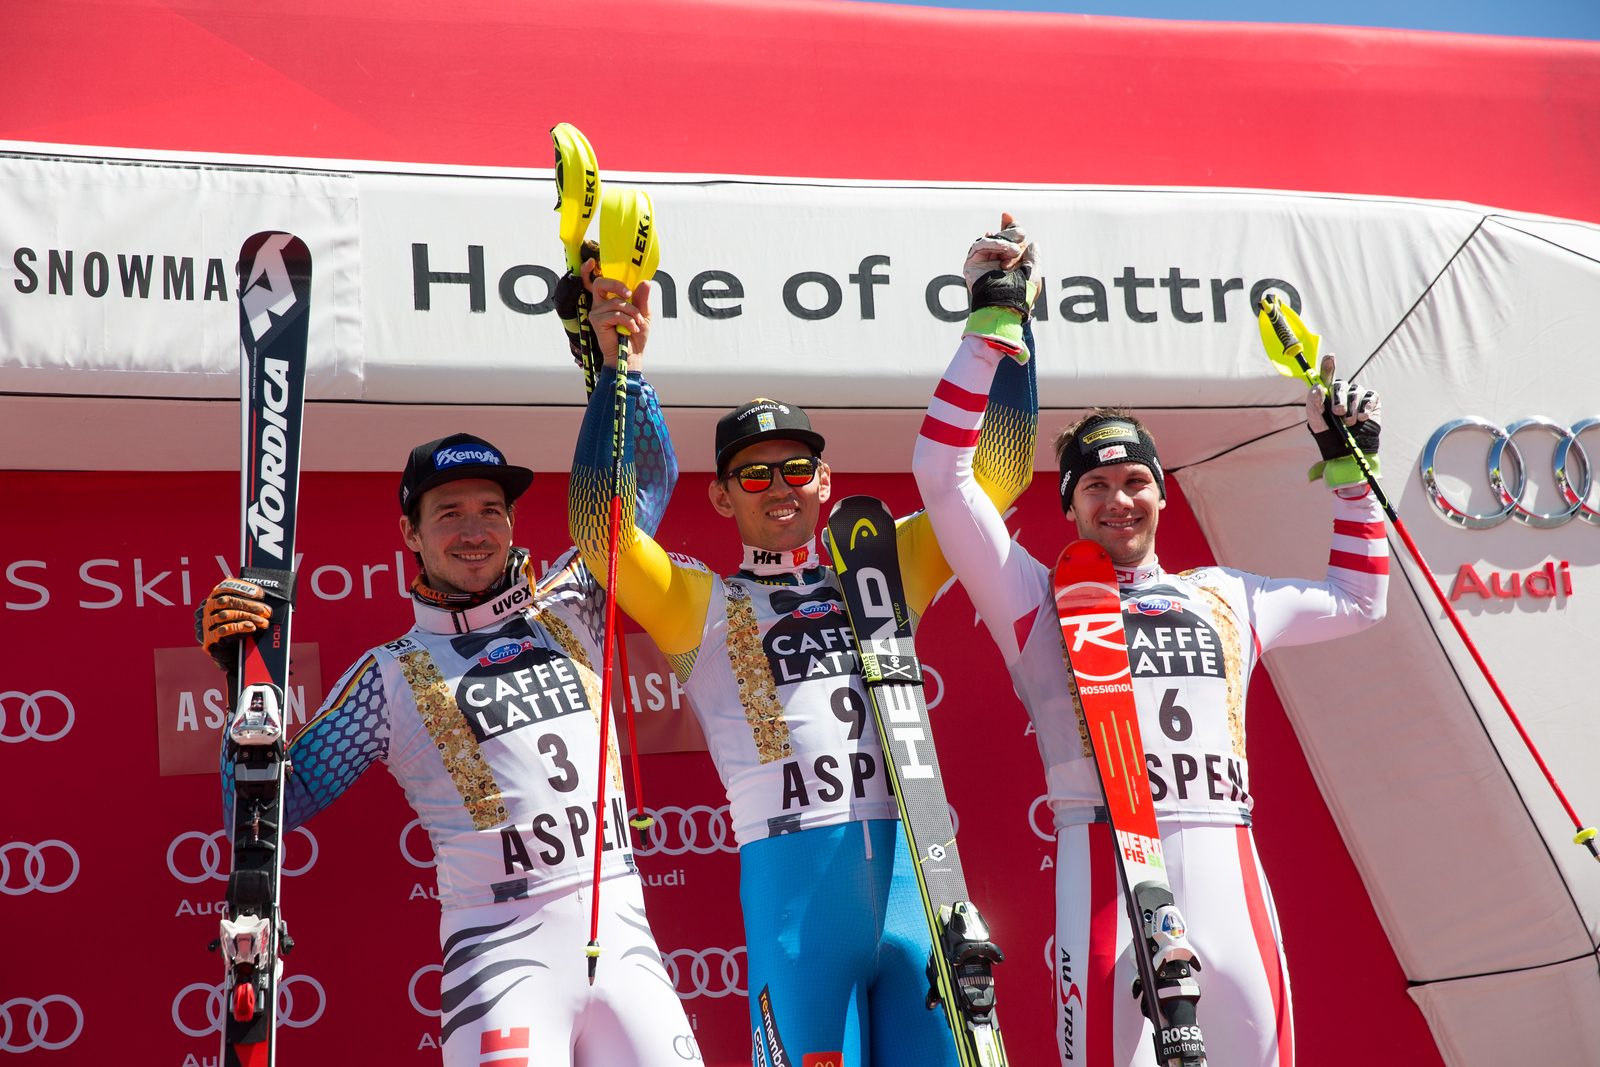 Felix Neureuther, Andre Myhrer and Michael Macho Slalom 2017 Audi FIS Ski World Cup finals in Aspen, CO. Photo: U.S. Ski Team